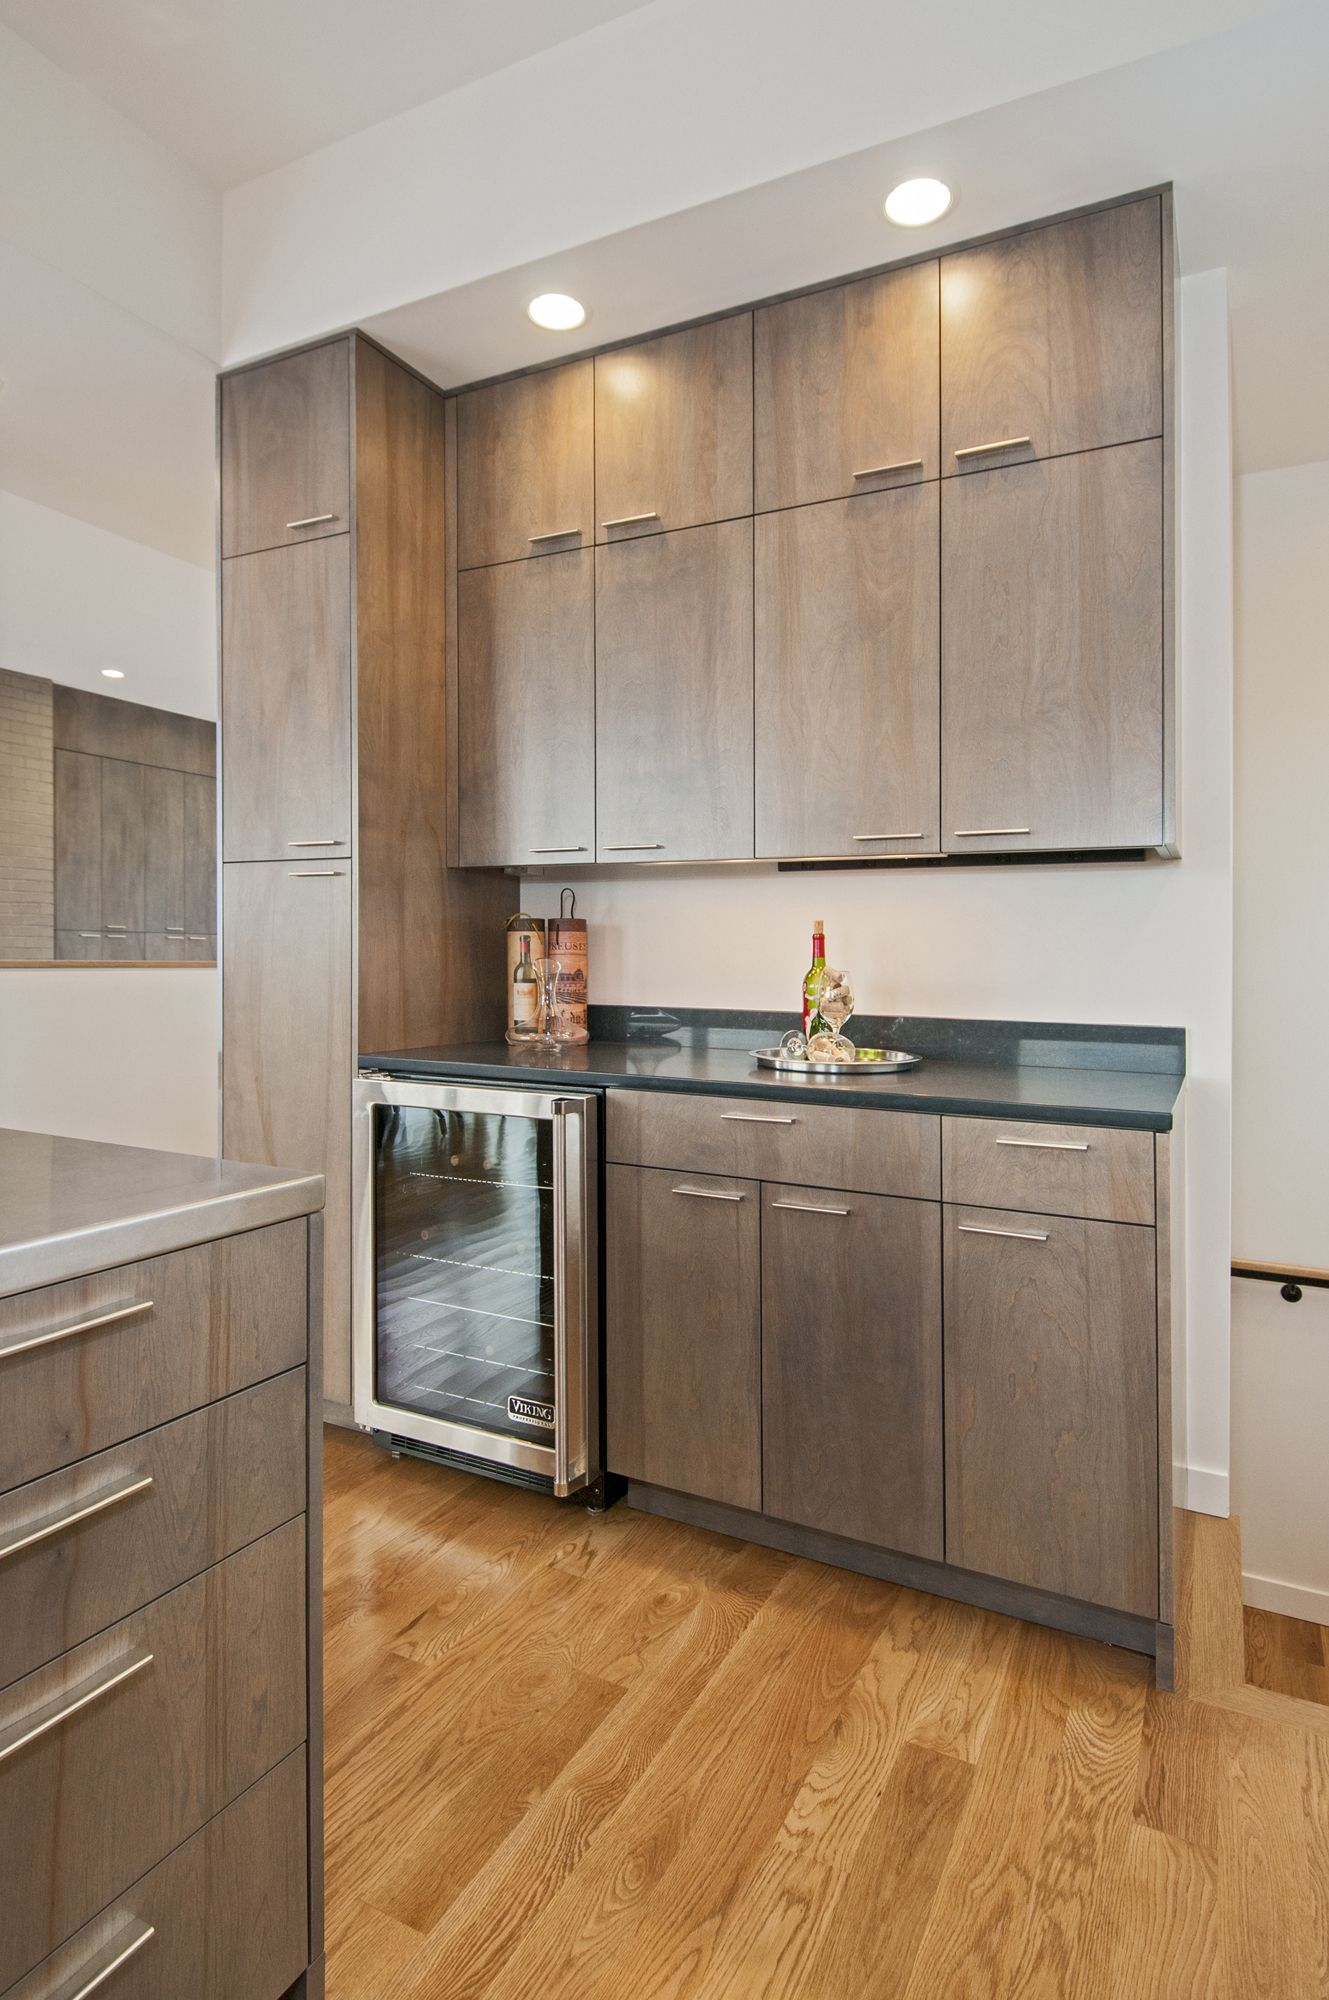 Kitchen Full Overlay Birch Stained Custom Gray Stained Kitchen Cabinets Staining Cabinets Birch Kitchen Cabinets